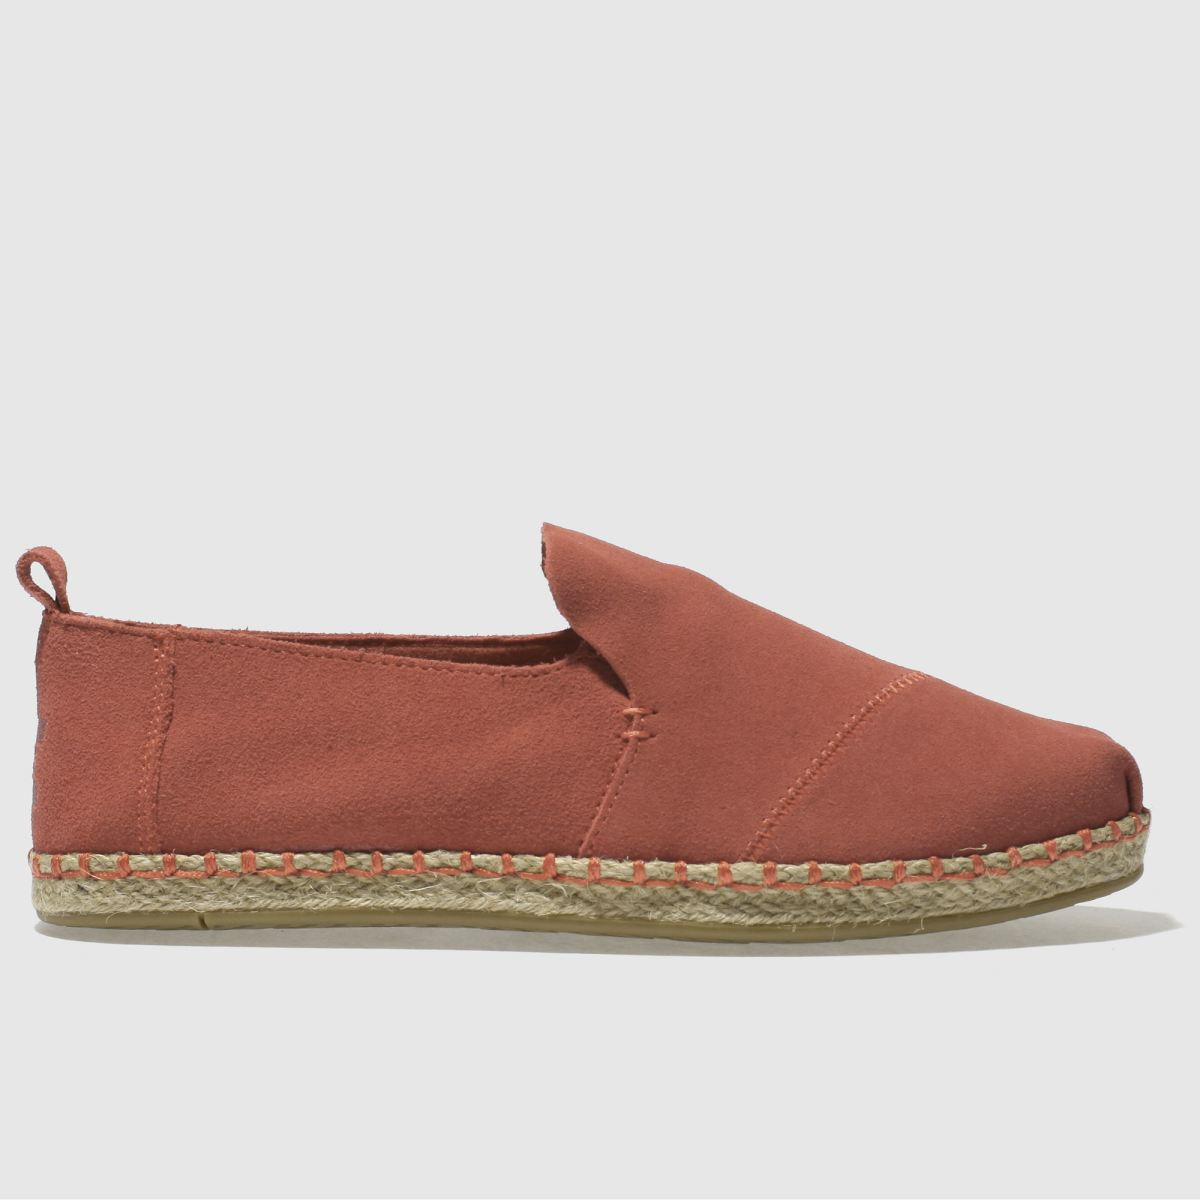 Toms Coral Deconstructed Alpargata Flat Shoes